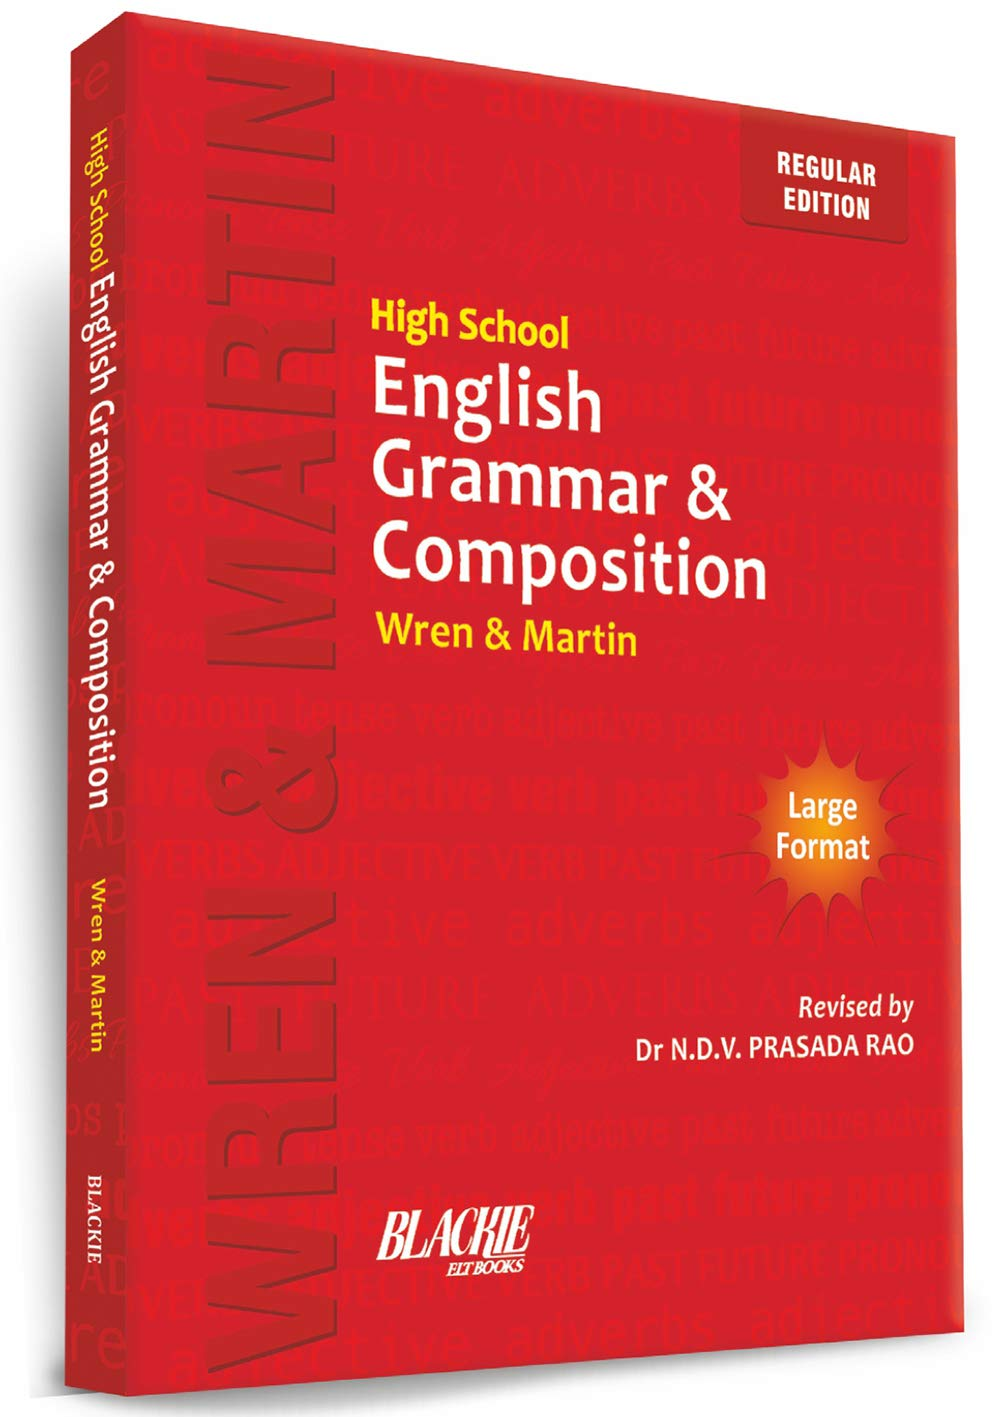 Buy Wren & Martin High School English Grammar And Composition Book ...